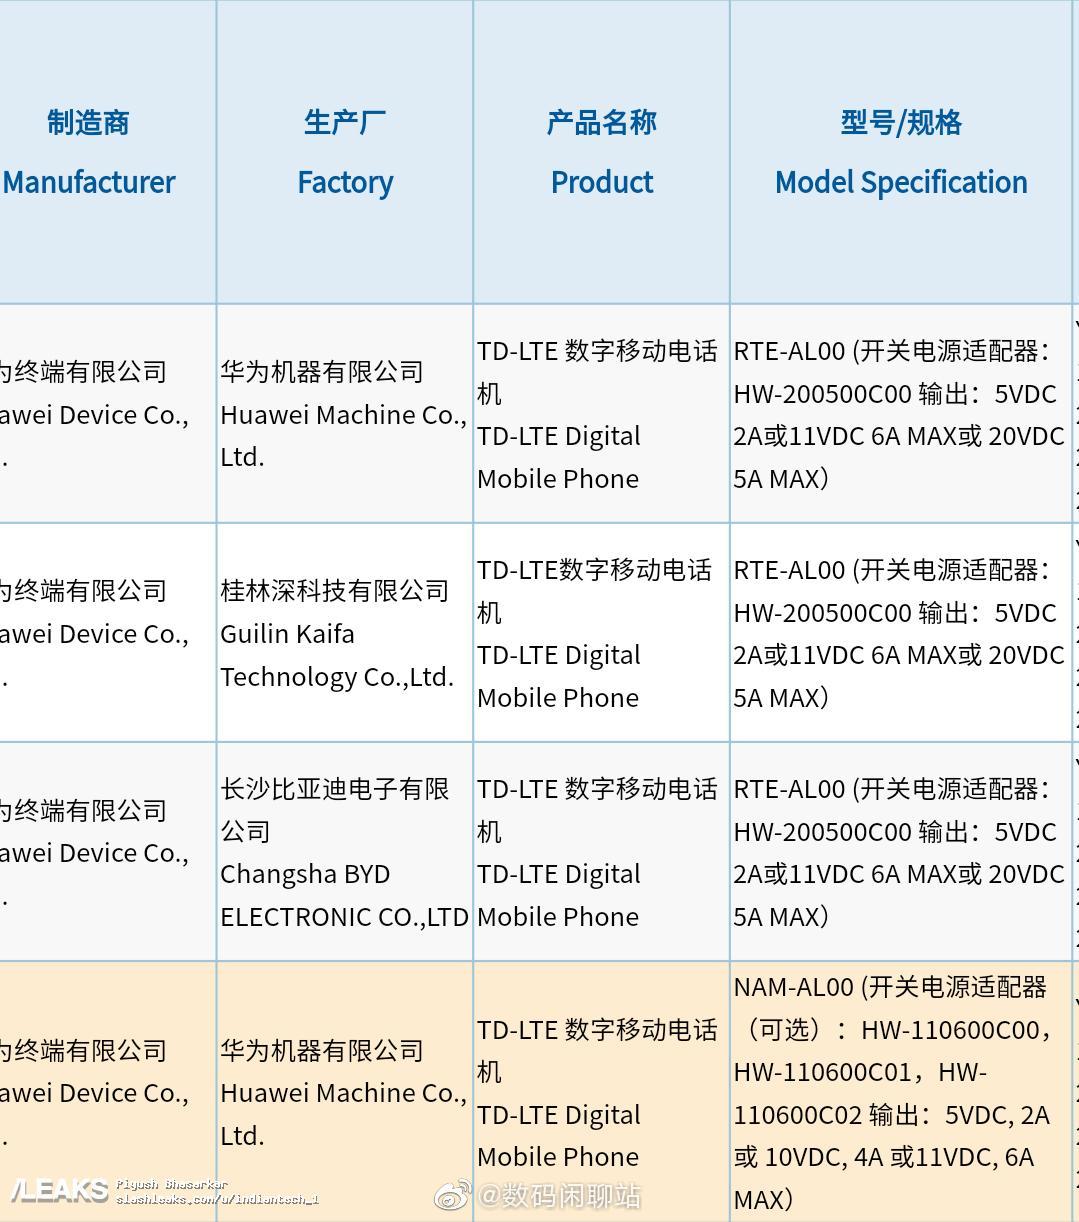 img Huawei nova 9 series smartphone charging tech Reviled via 3C certification